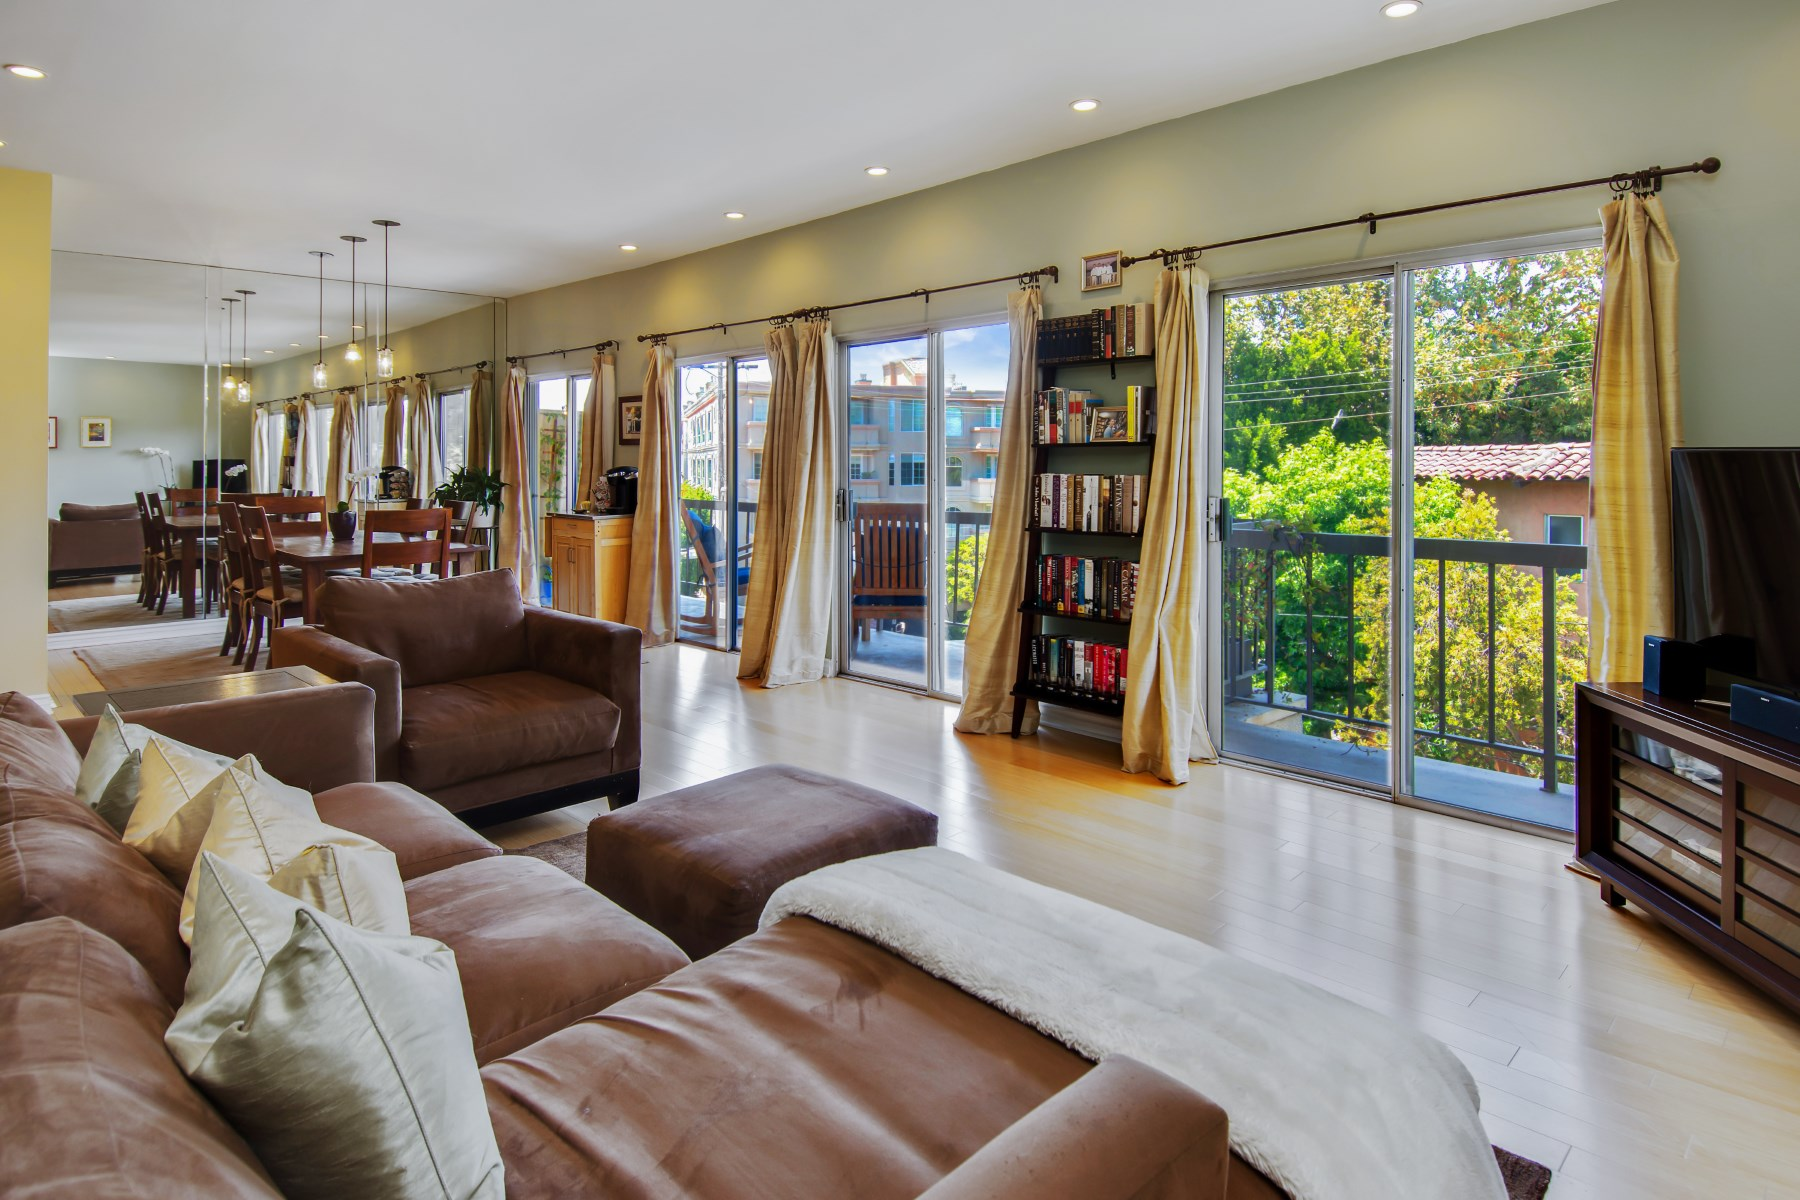 Condomínio para Venda às Top Floor Brentwood Gem 612 S Barrington Ave 415 Brentwood, Los Angeles, Califórnia, 90049 Estados Unidos